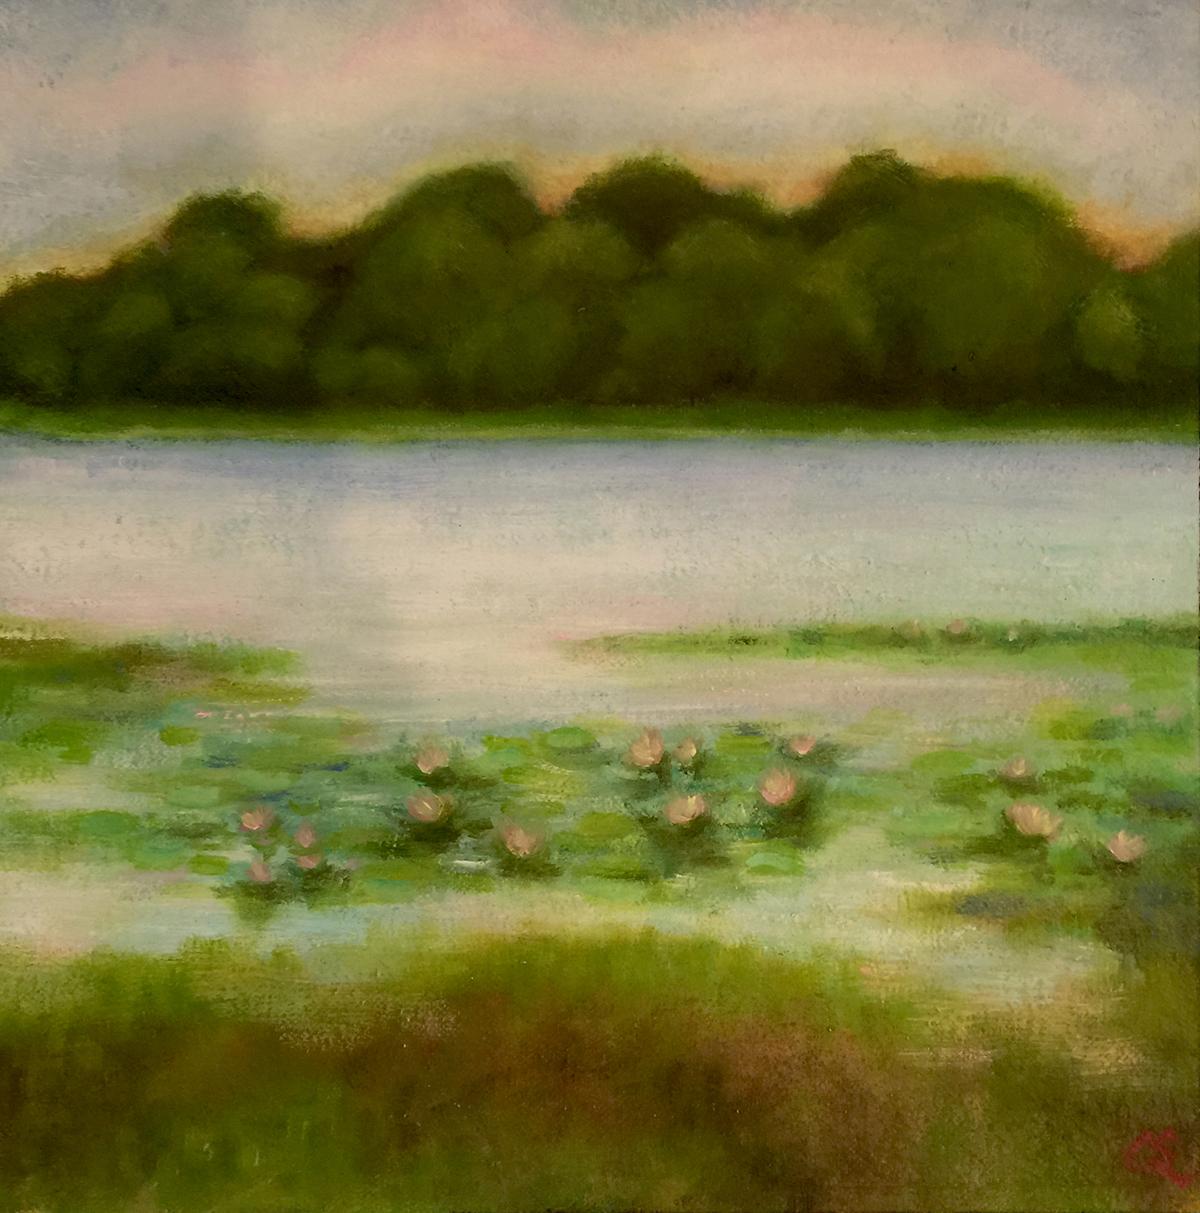 landscape-lillie cove.jpg